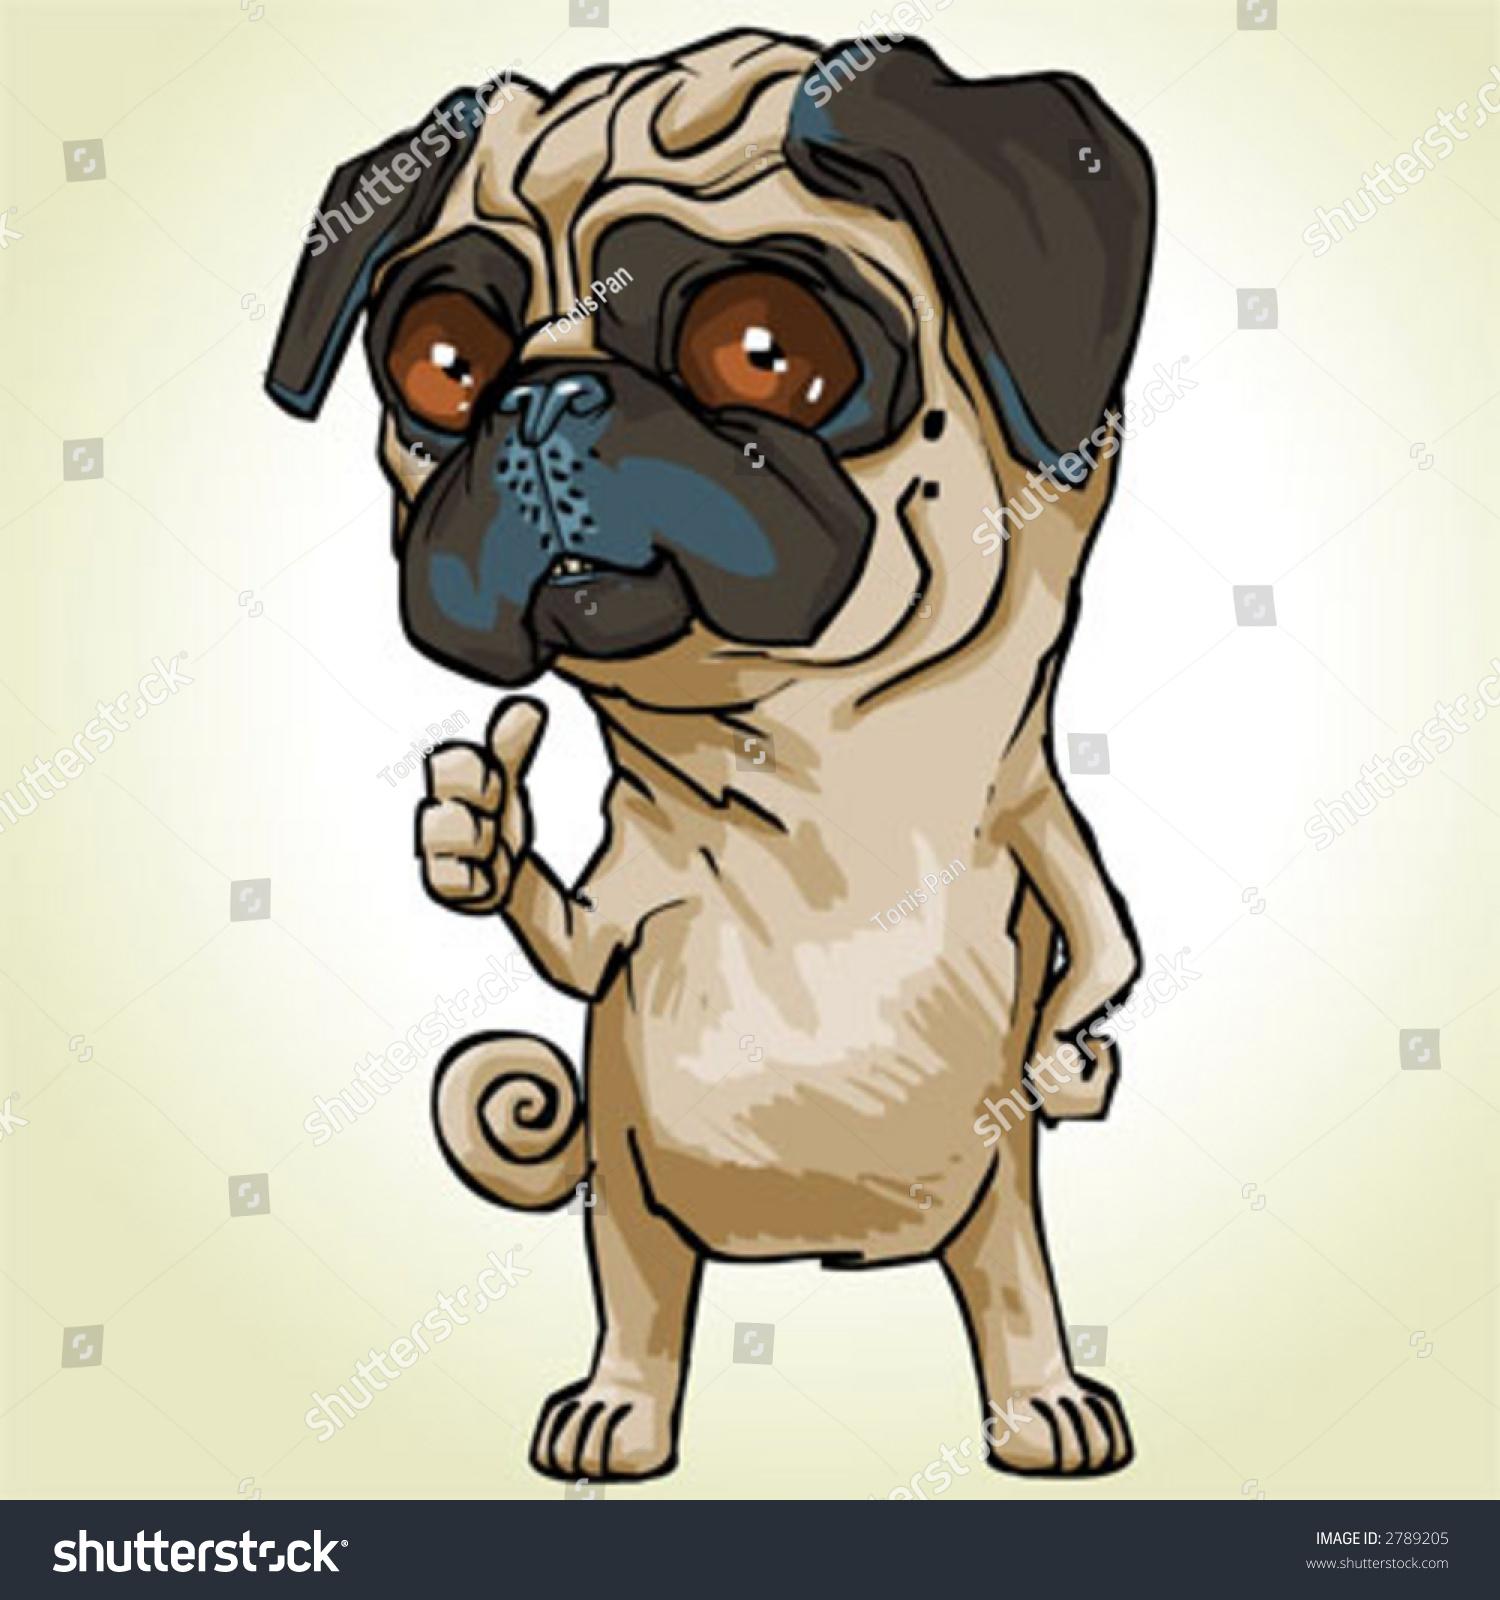 how to draw a cartoon pug